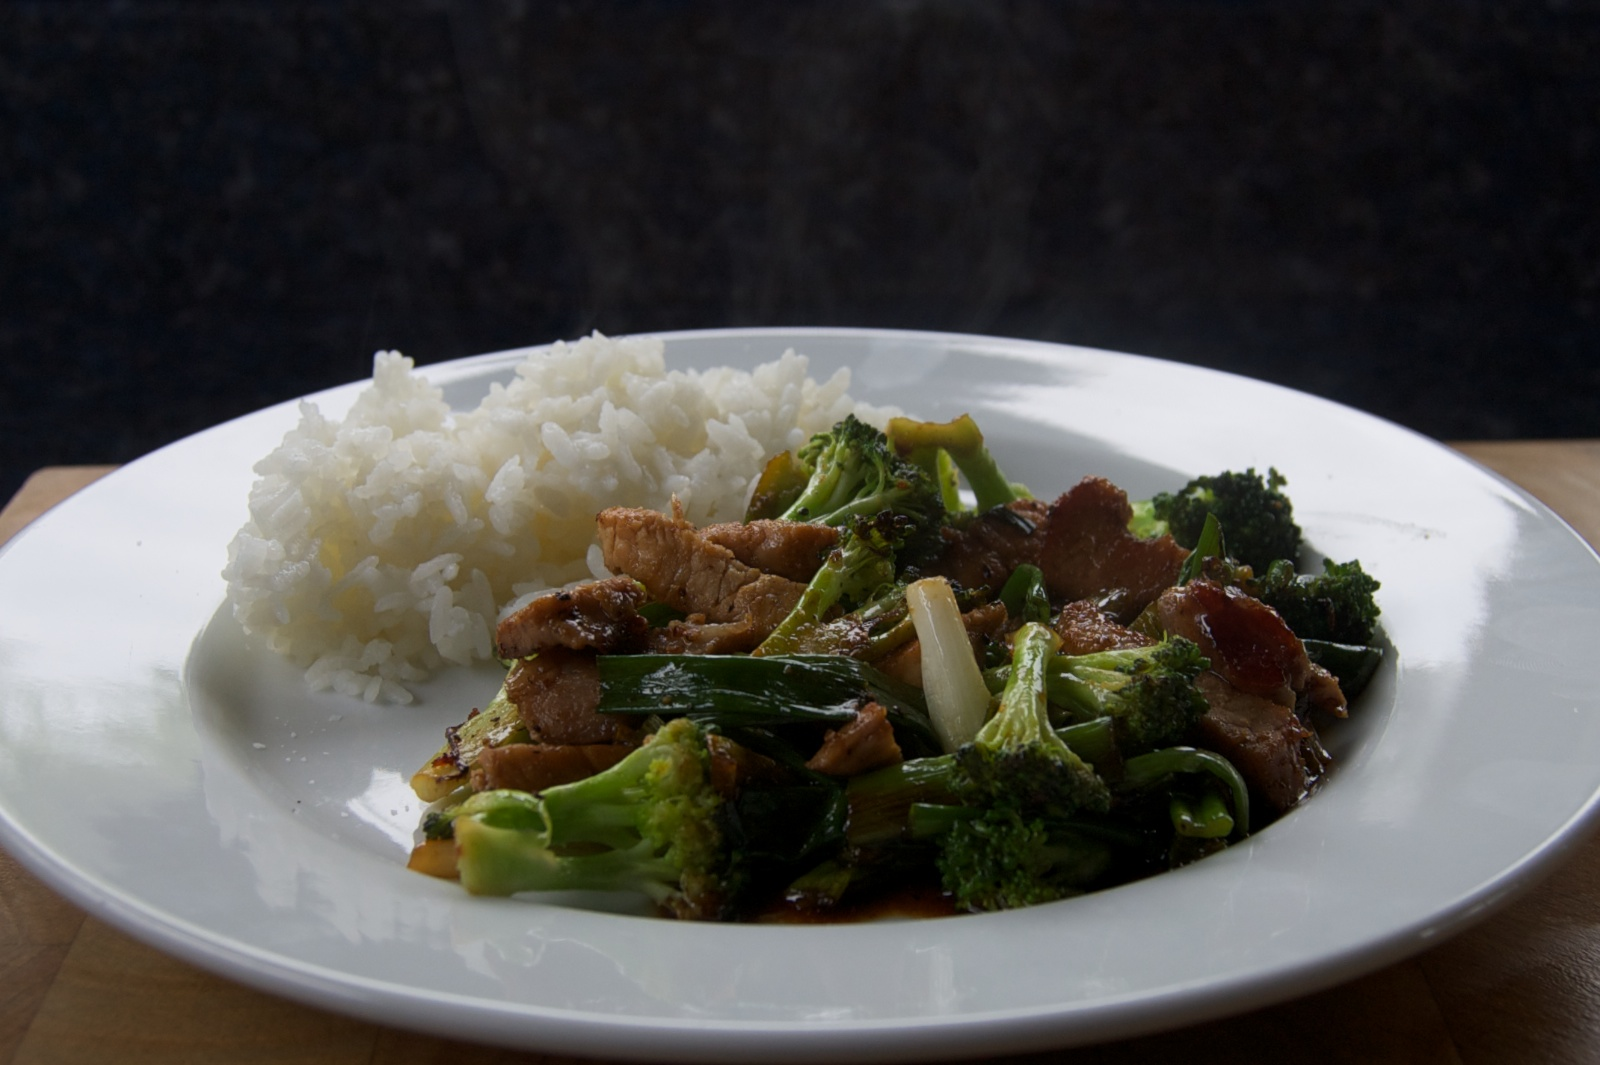 http://blog.rickk.com/food/2014/05/21/ate.2014.05.21.l.jpg